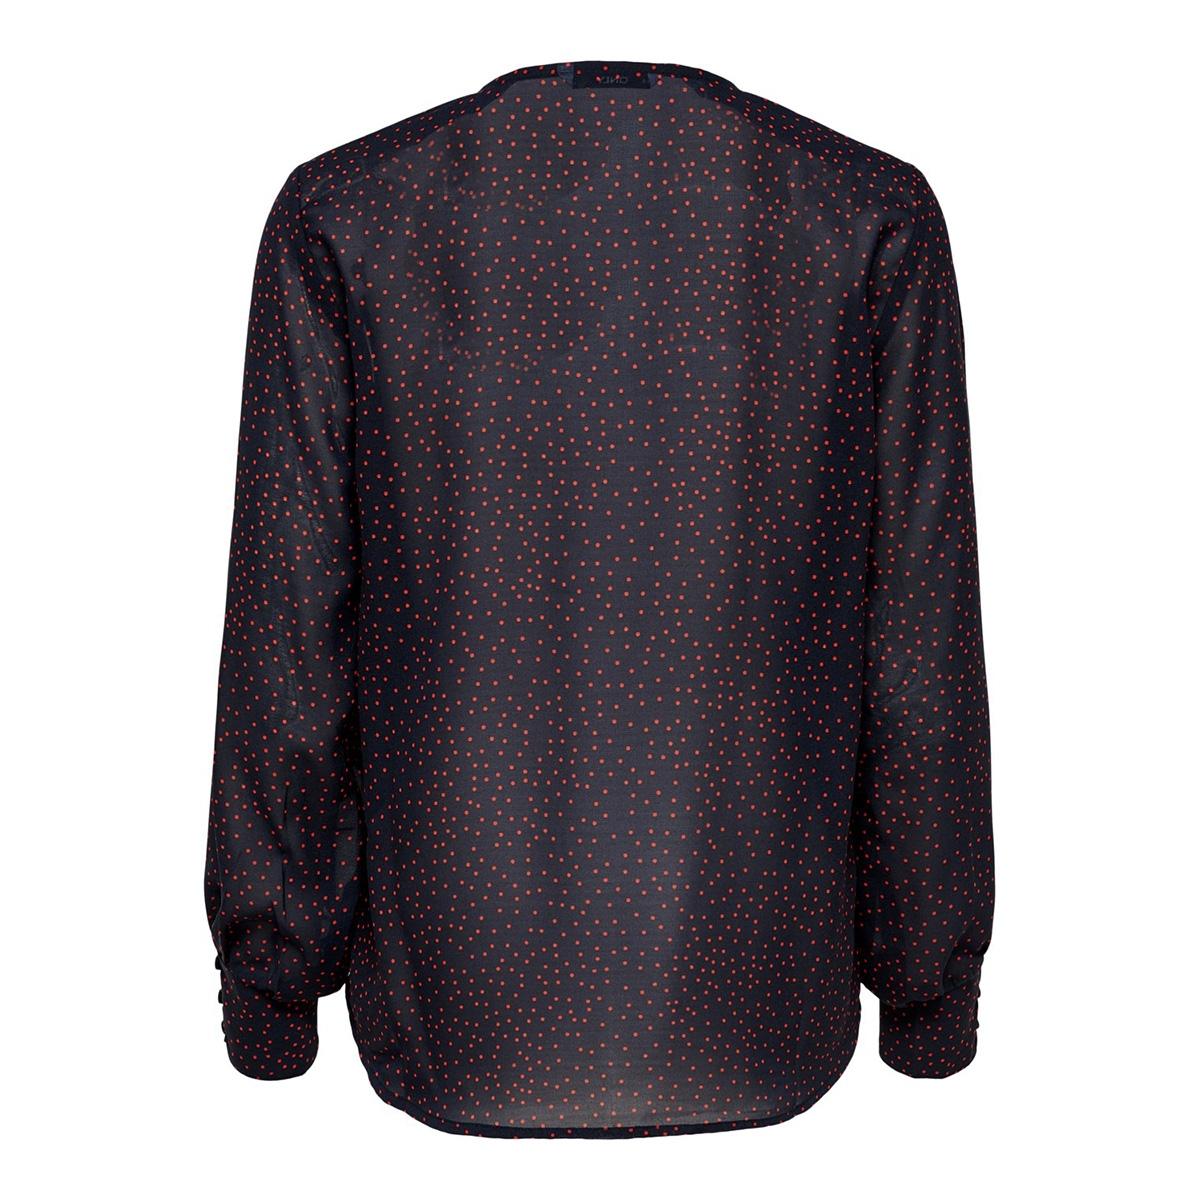 onlbeatrice life l/s v-neck top wvn 15196249 only blouse night sky/high risk